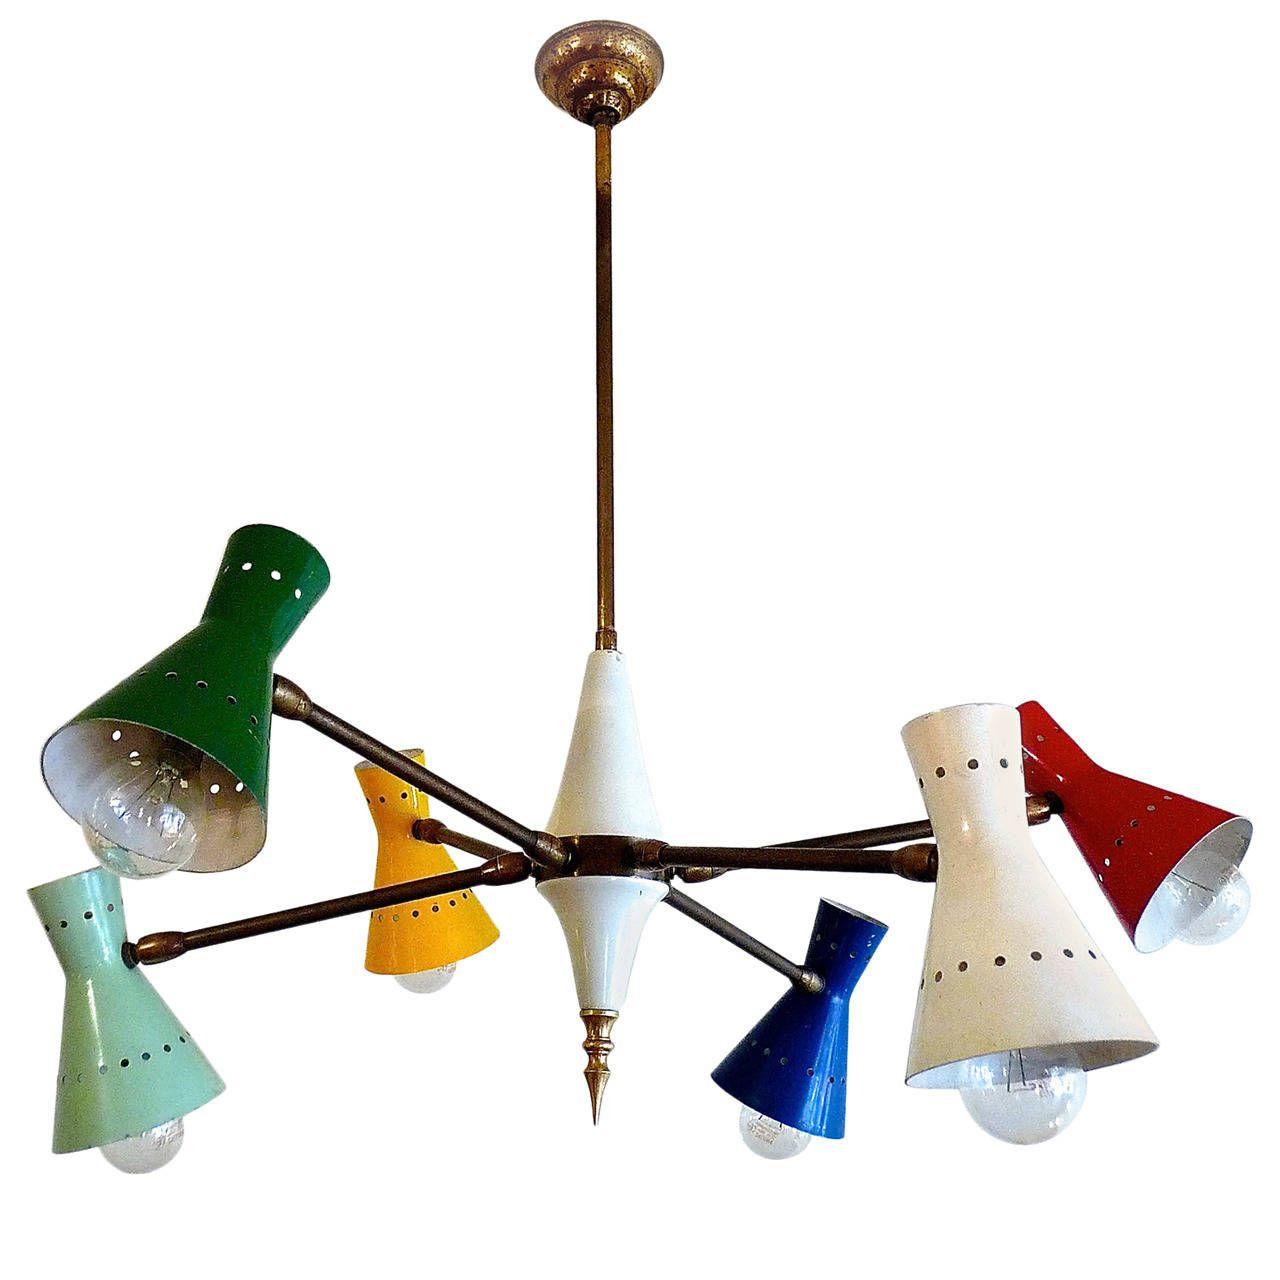 Arredoluce Chandelier With Six Articulated Arms Vintage Chandeliermodern Chandelierchandelierspendant Lightslight